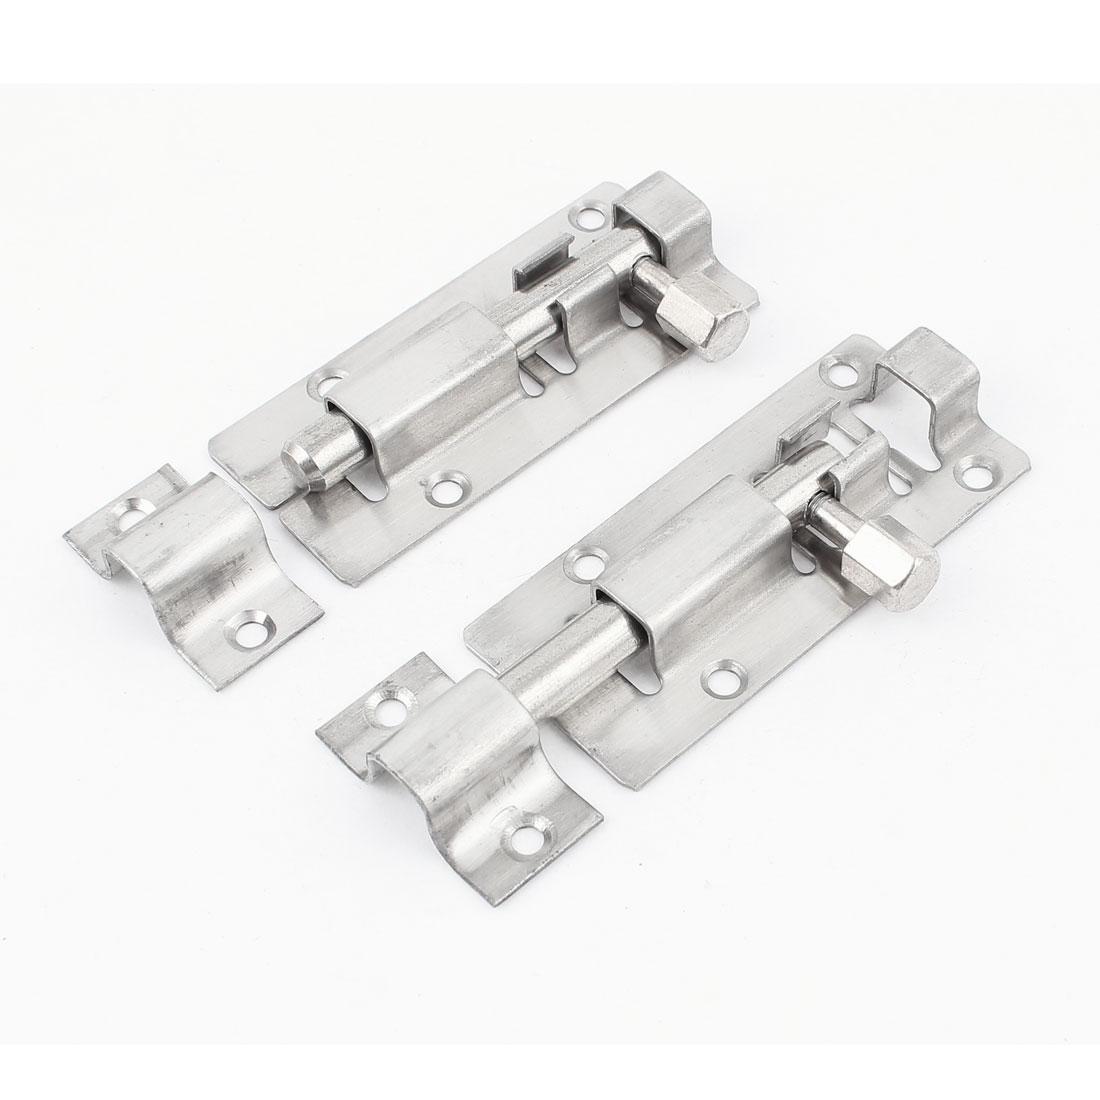 "3"" Long Stainless Steel Door Gates Latch Slide Lock Barrel Bolt 2pcs"